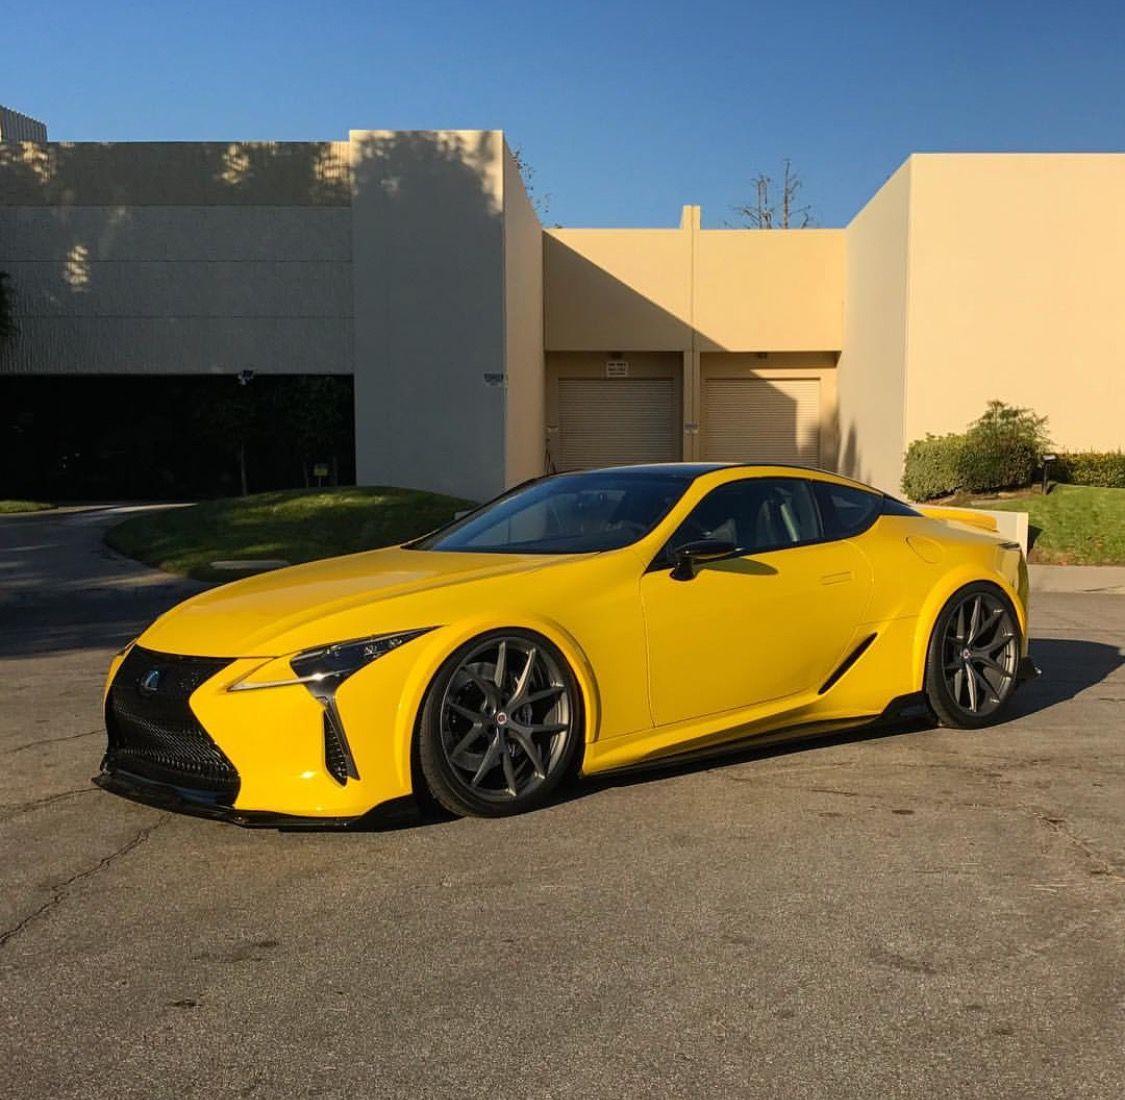 Lexus Car Wallpaper: Cars And Toyota